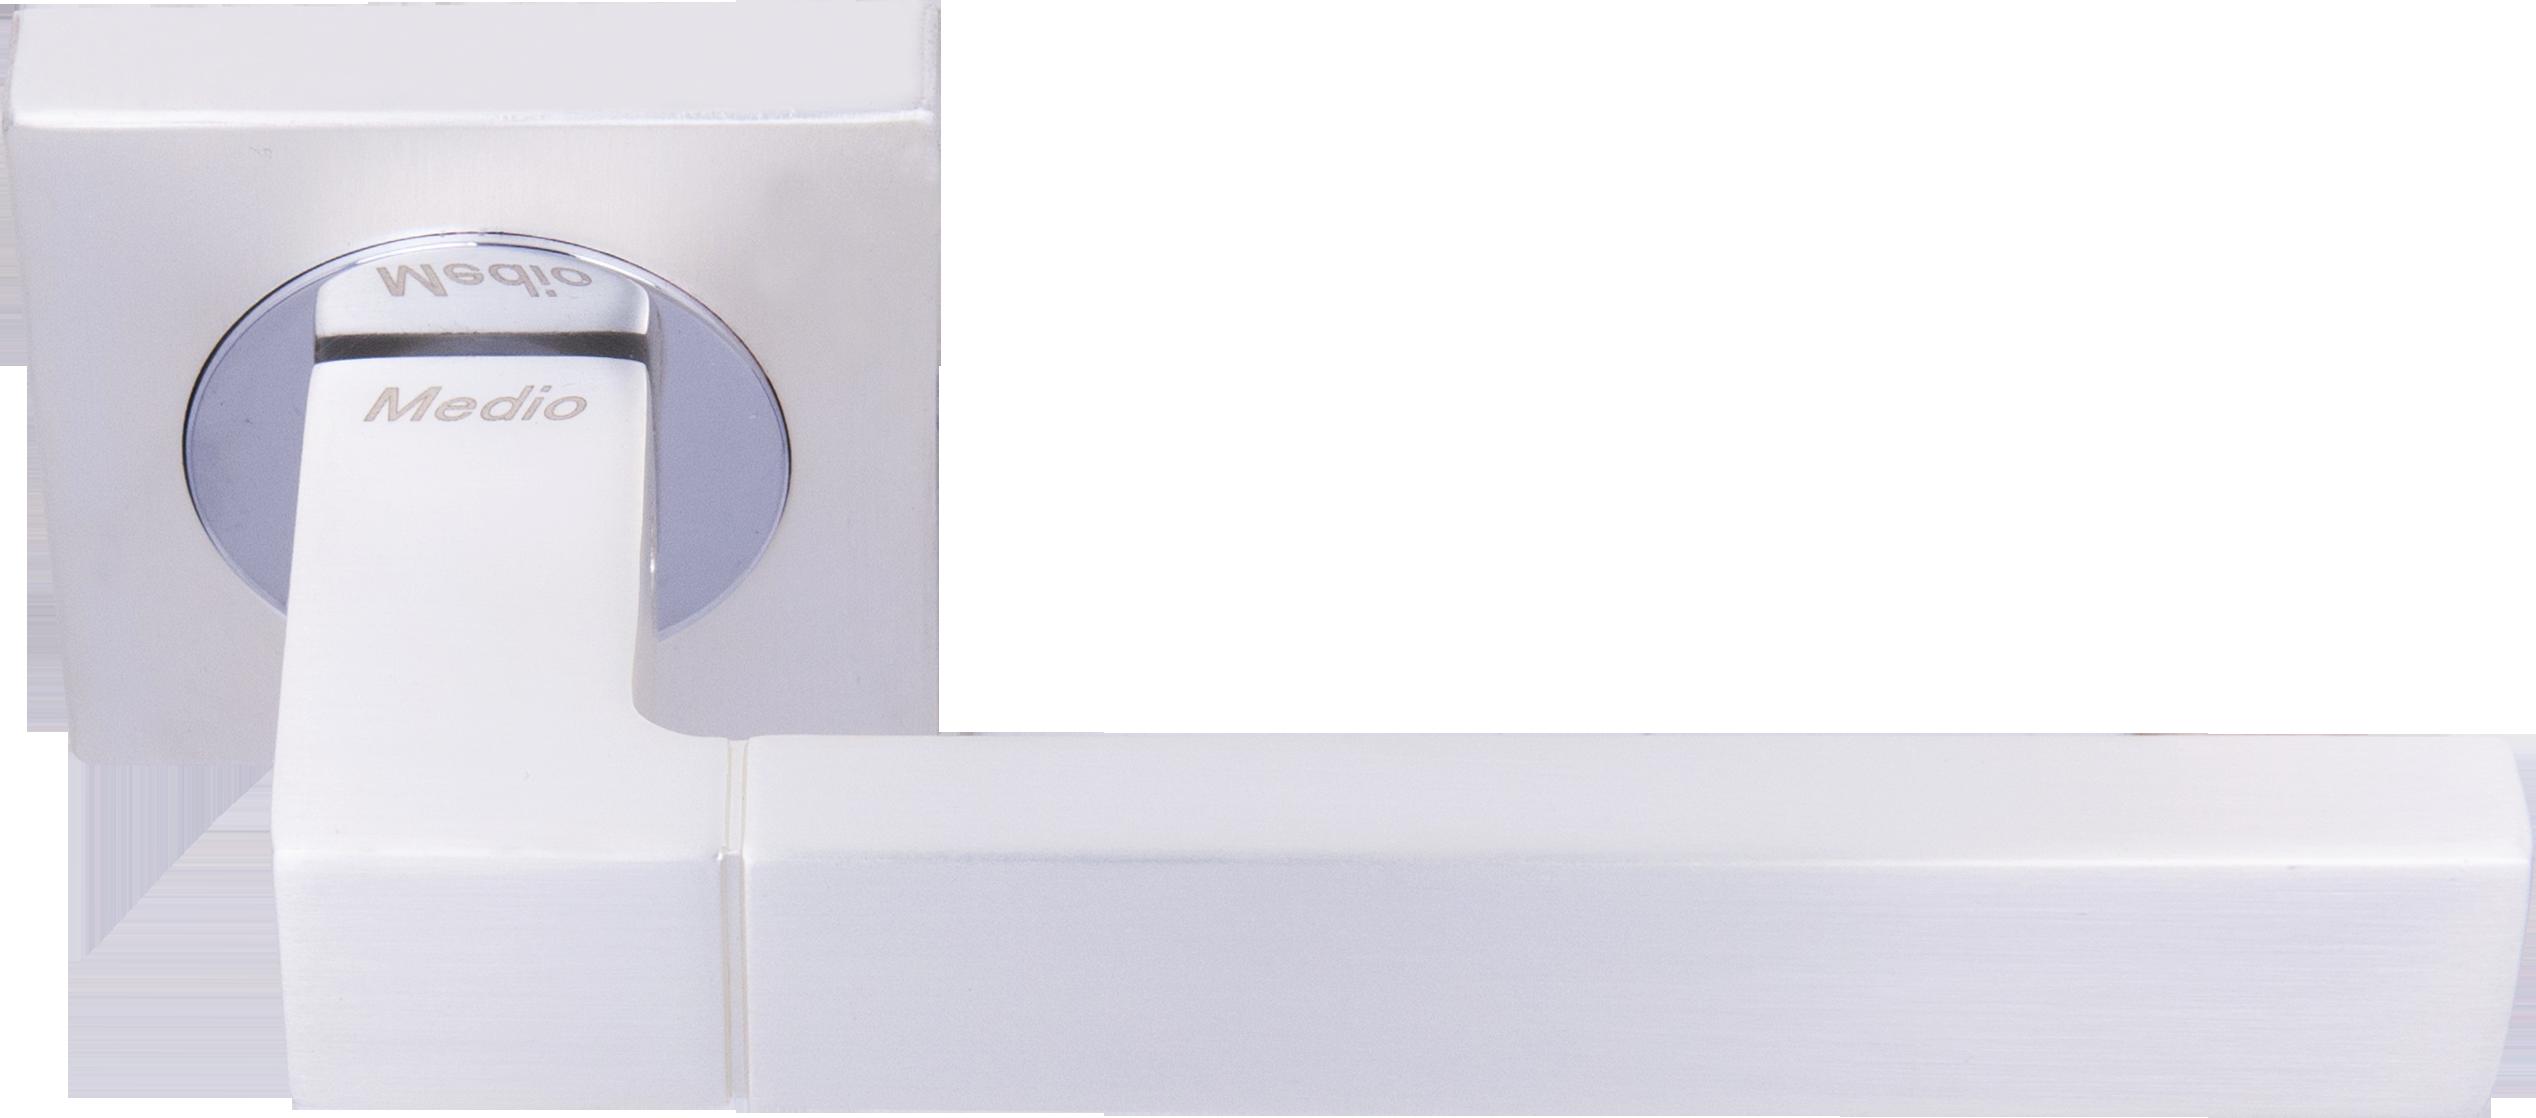 Ручка Медио L09-232 CP/SILVER хром/серебро (20 шт)